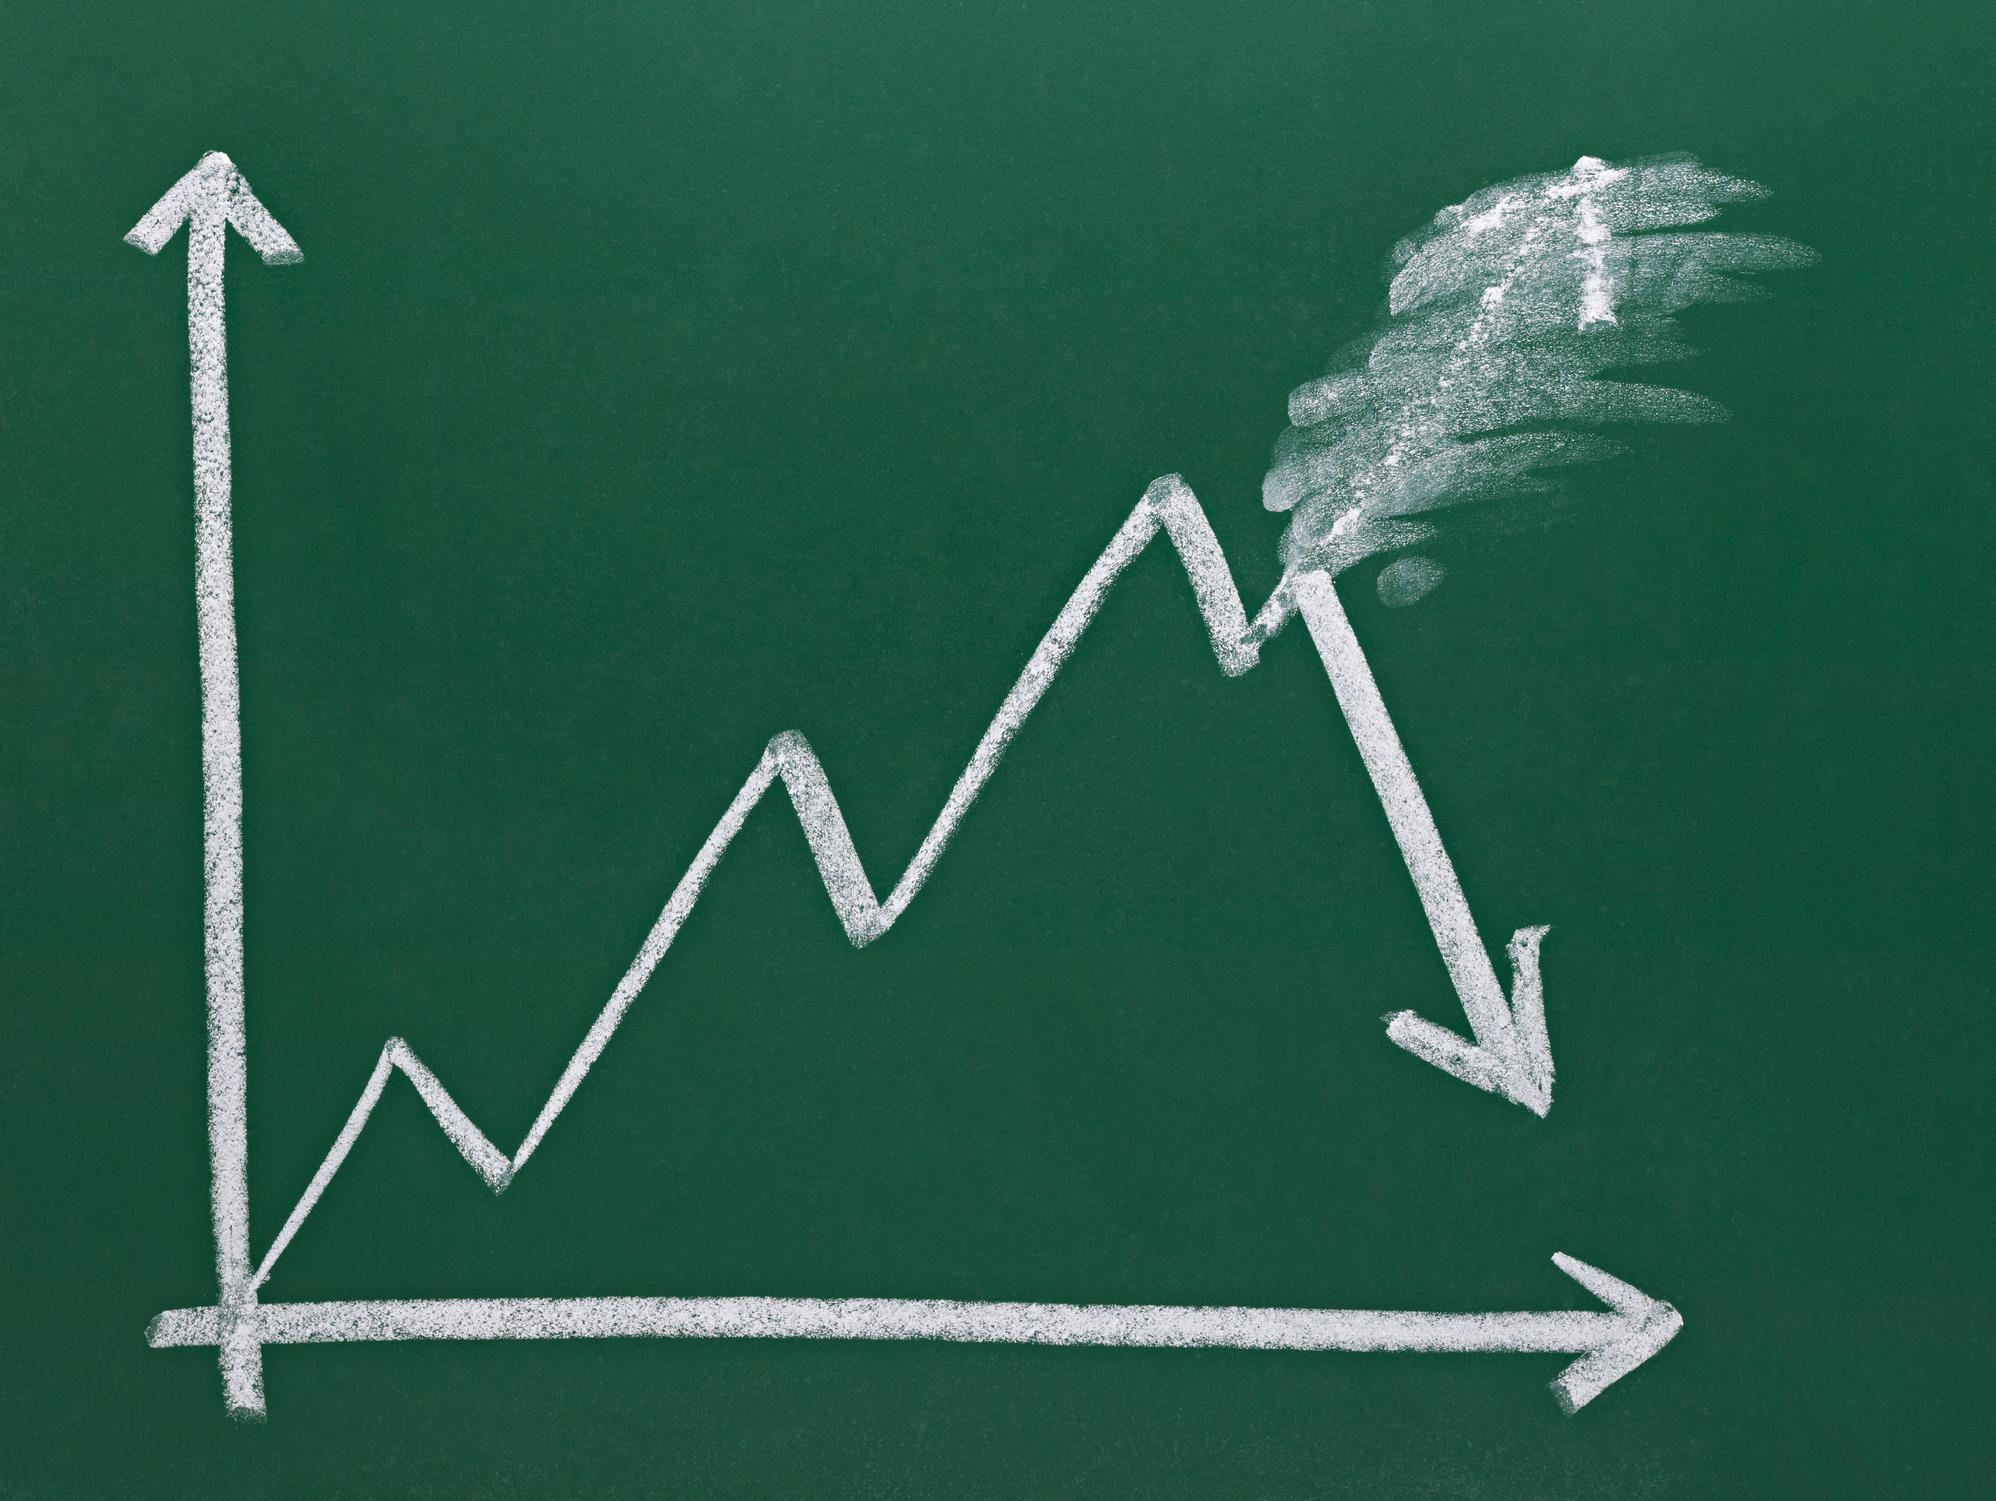 Green chalkboard chart showing a positive trend turn negative.